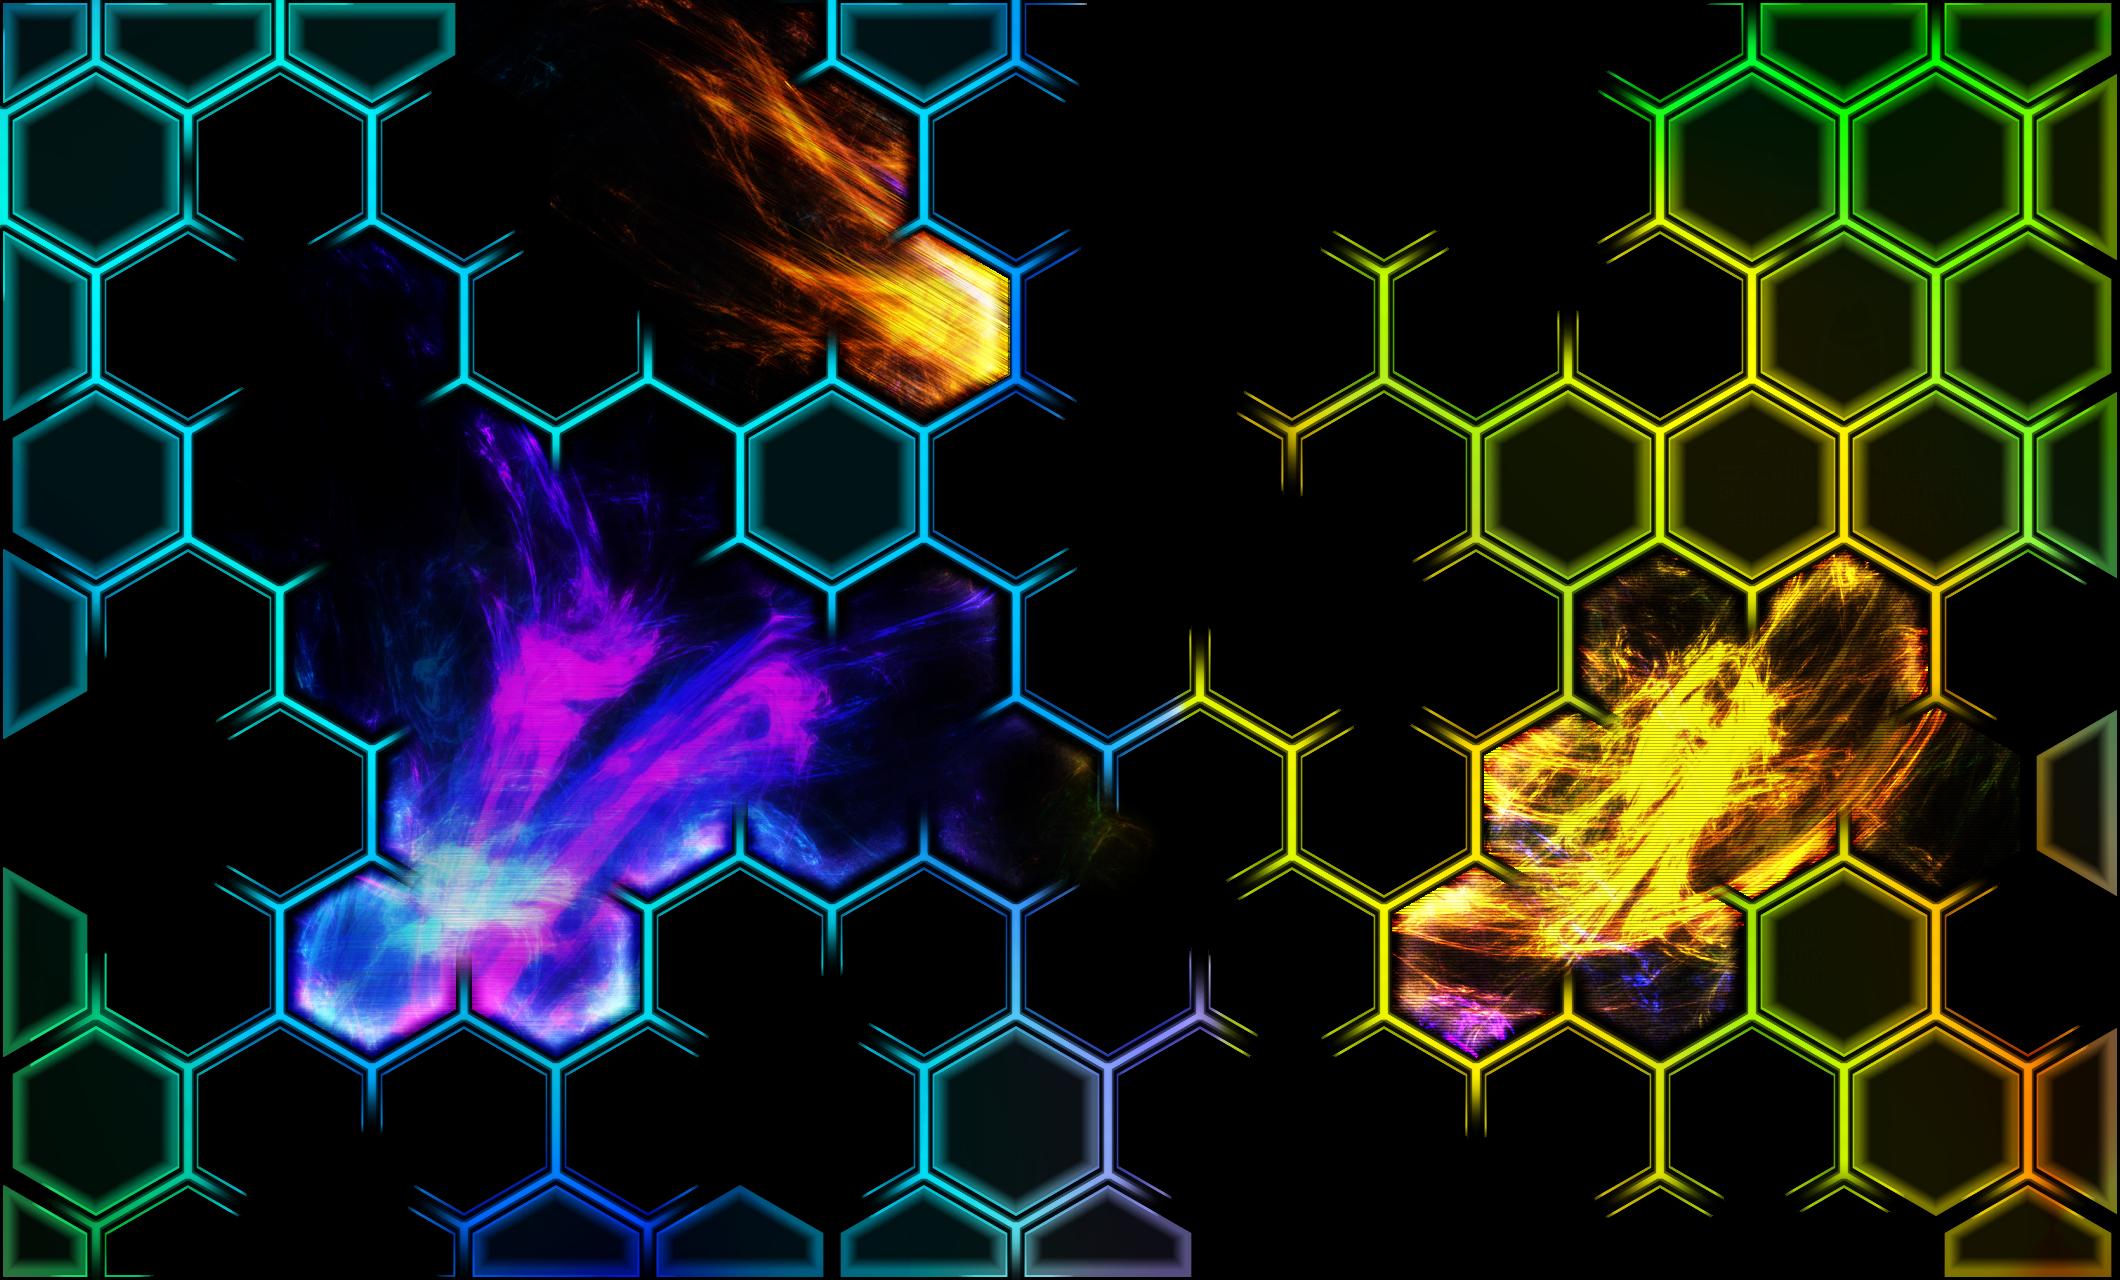 HexWall2012 - 1. Hexagonaphiliac: UnCut by callmesora